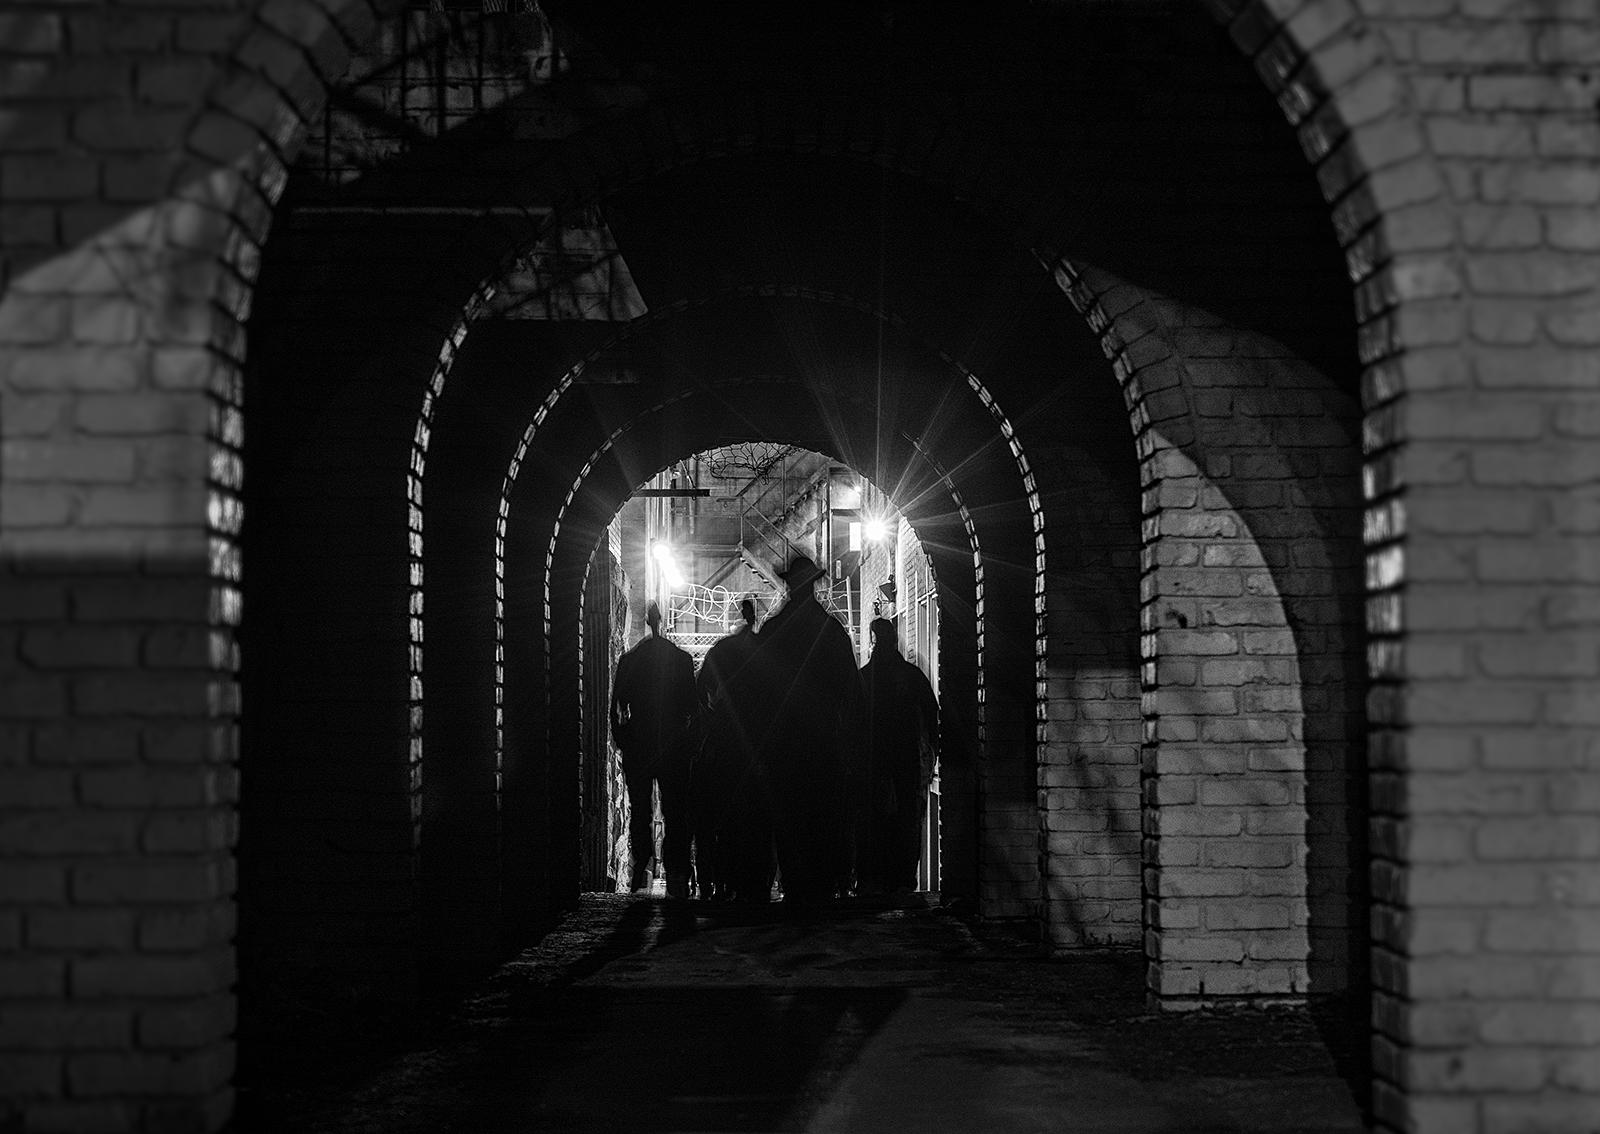 The Haunting Of Helmcken Alley bw.jpg